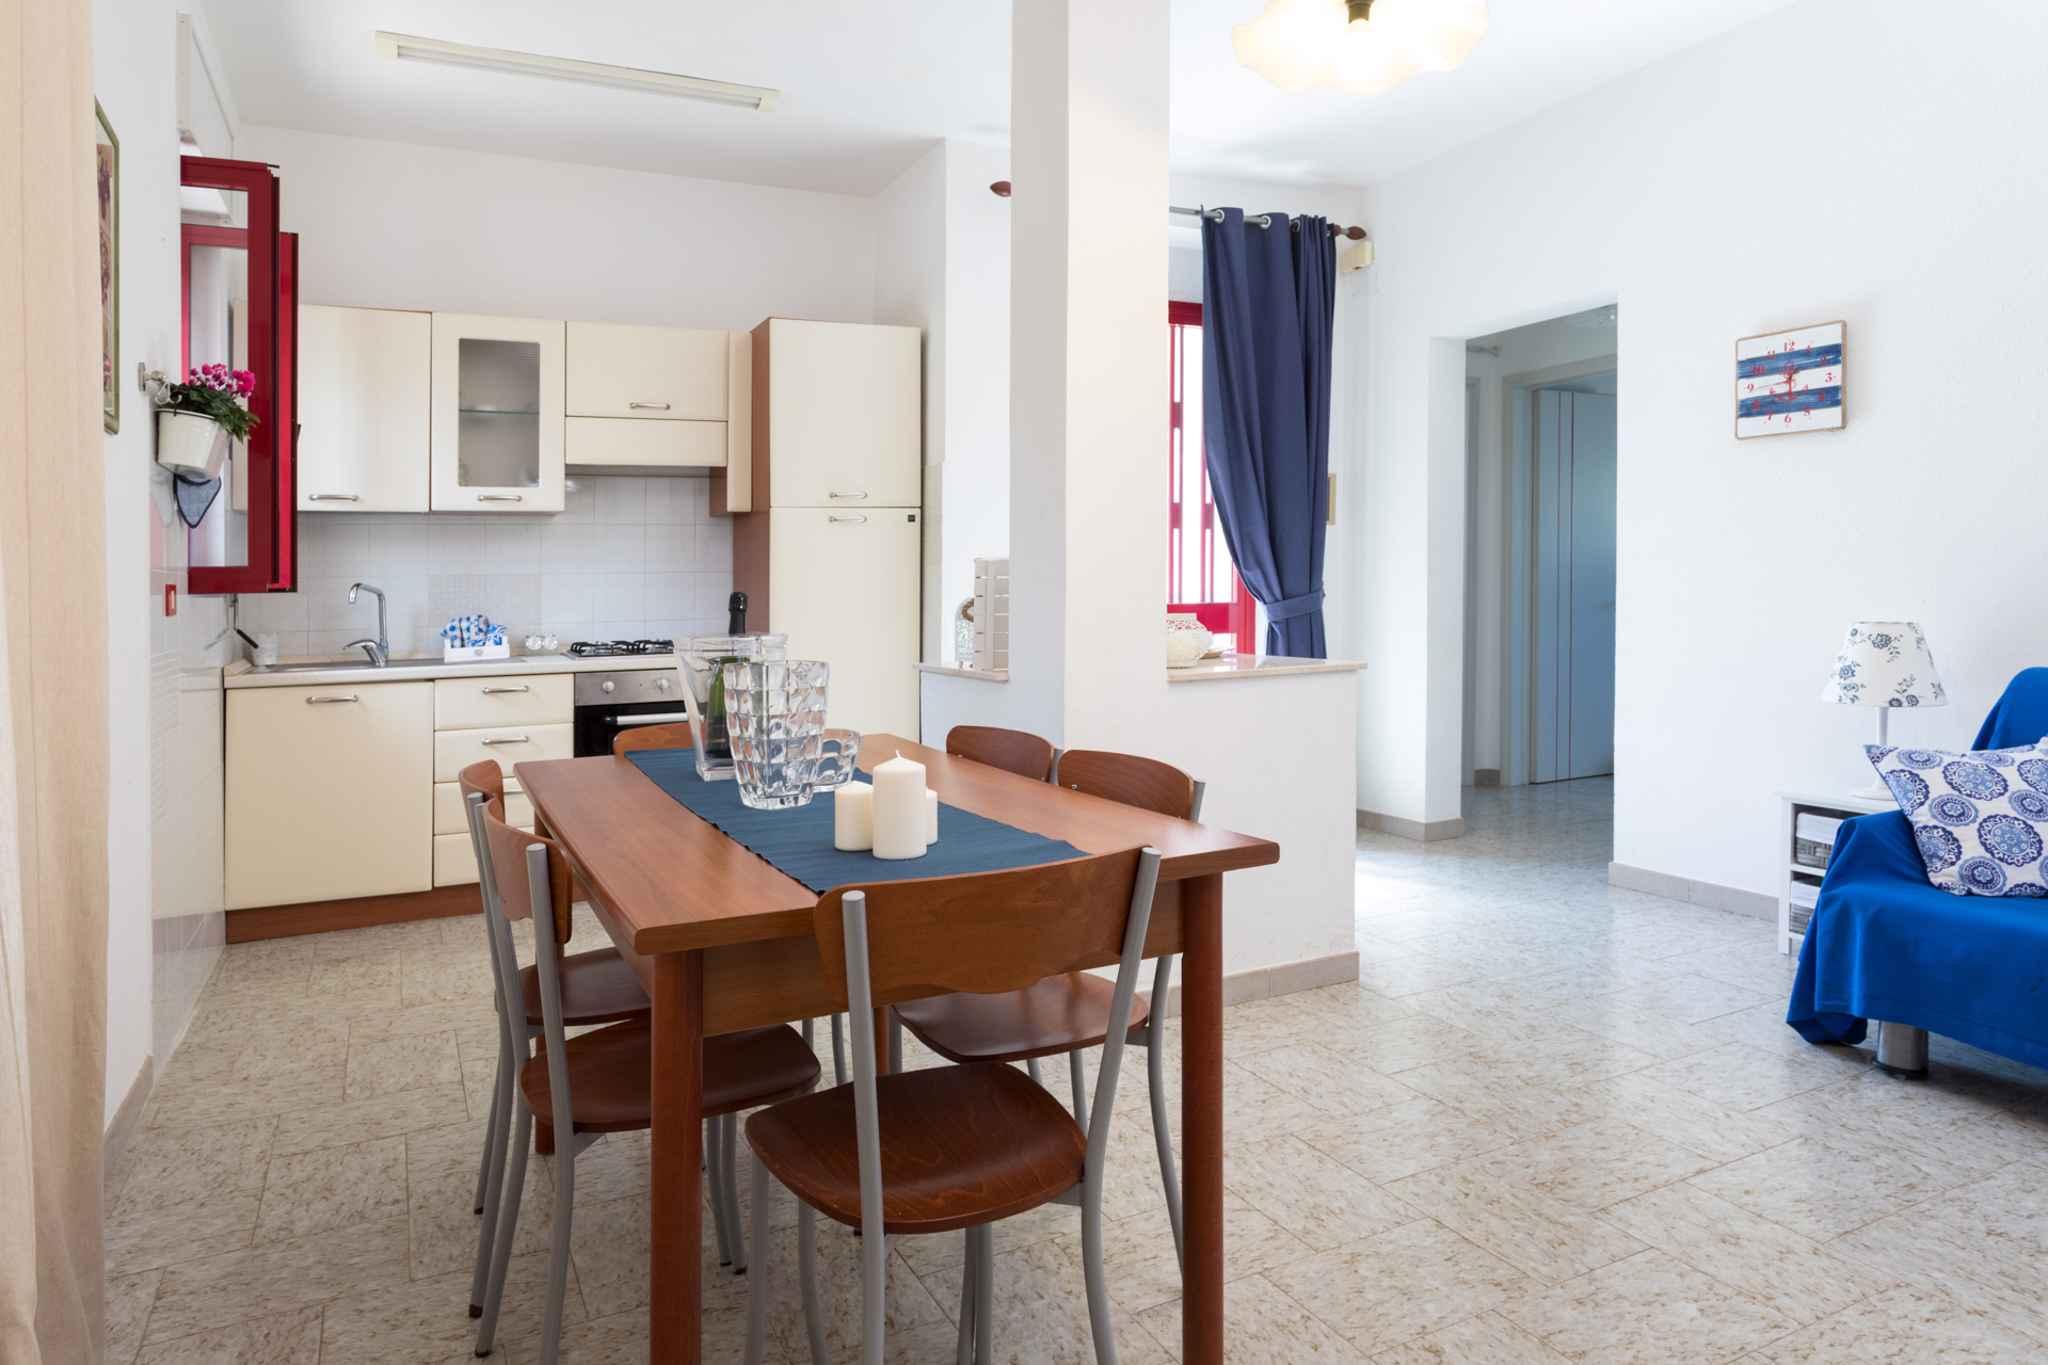 Ferienhaus Vicino Al Mare (560014), Alliste, Lecce, Apulien, Italien, Bild 17